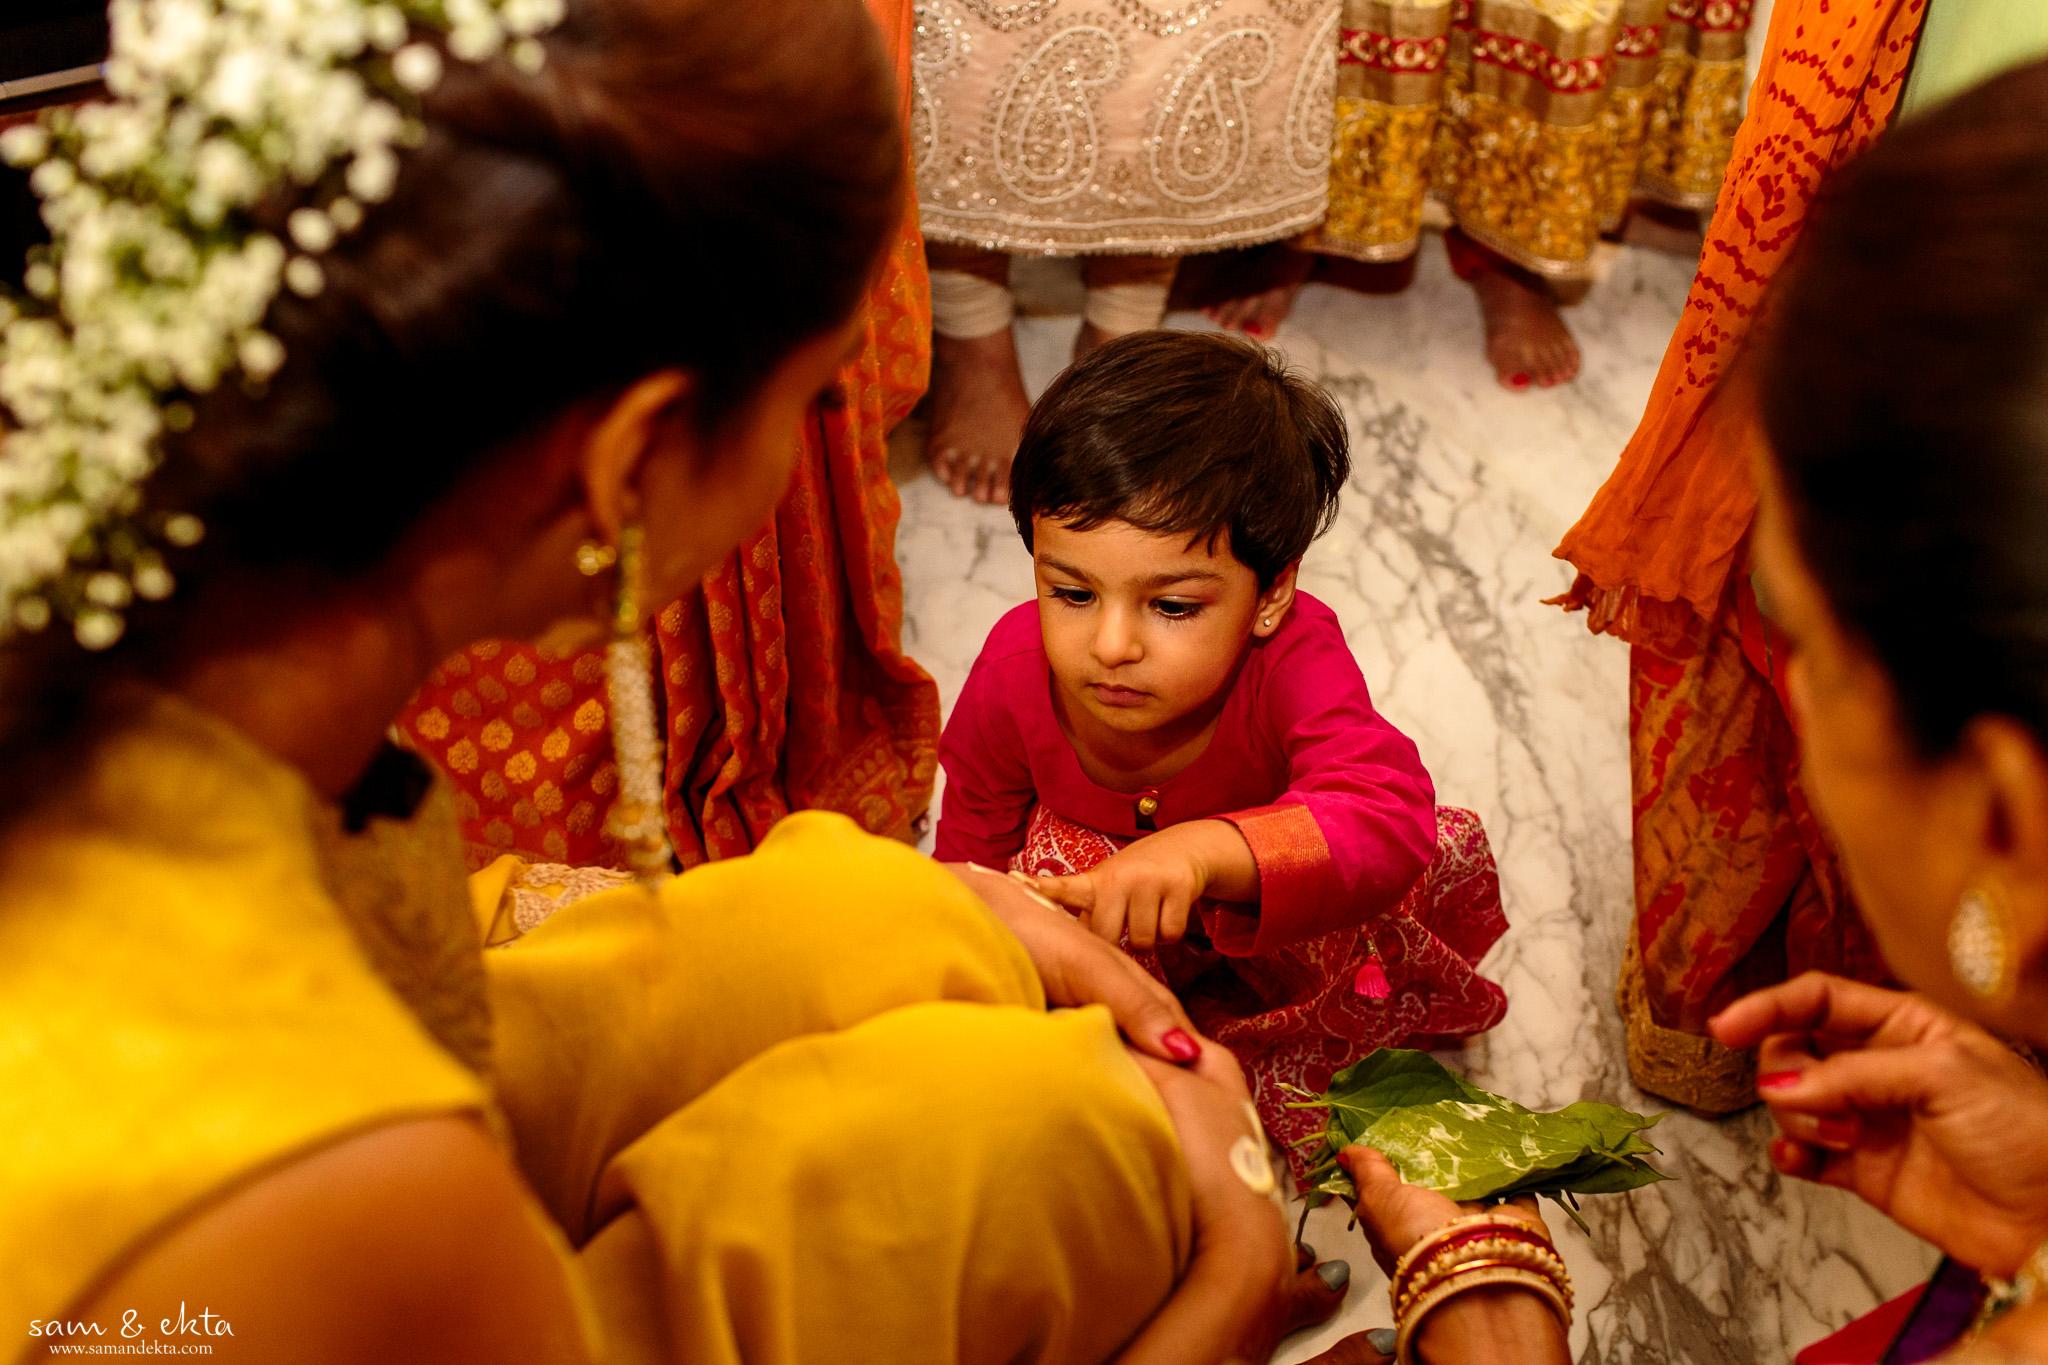 A&G_www.samandekta.com-6.jpg